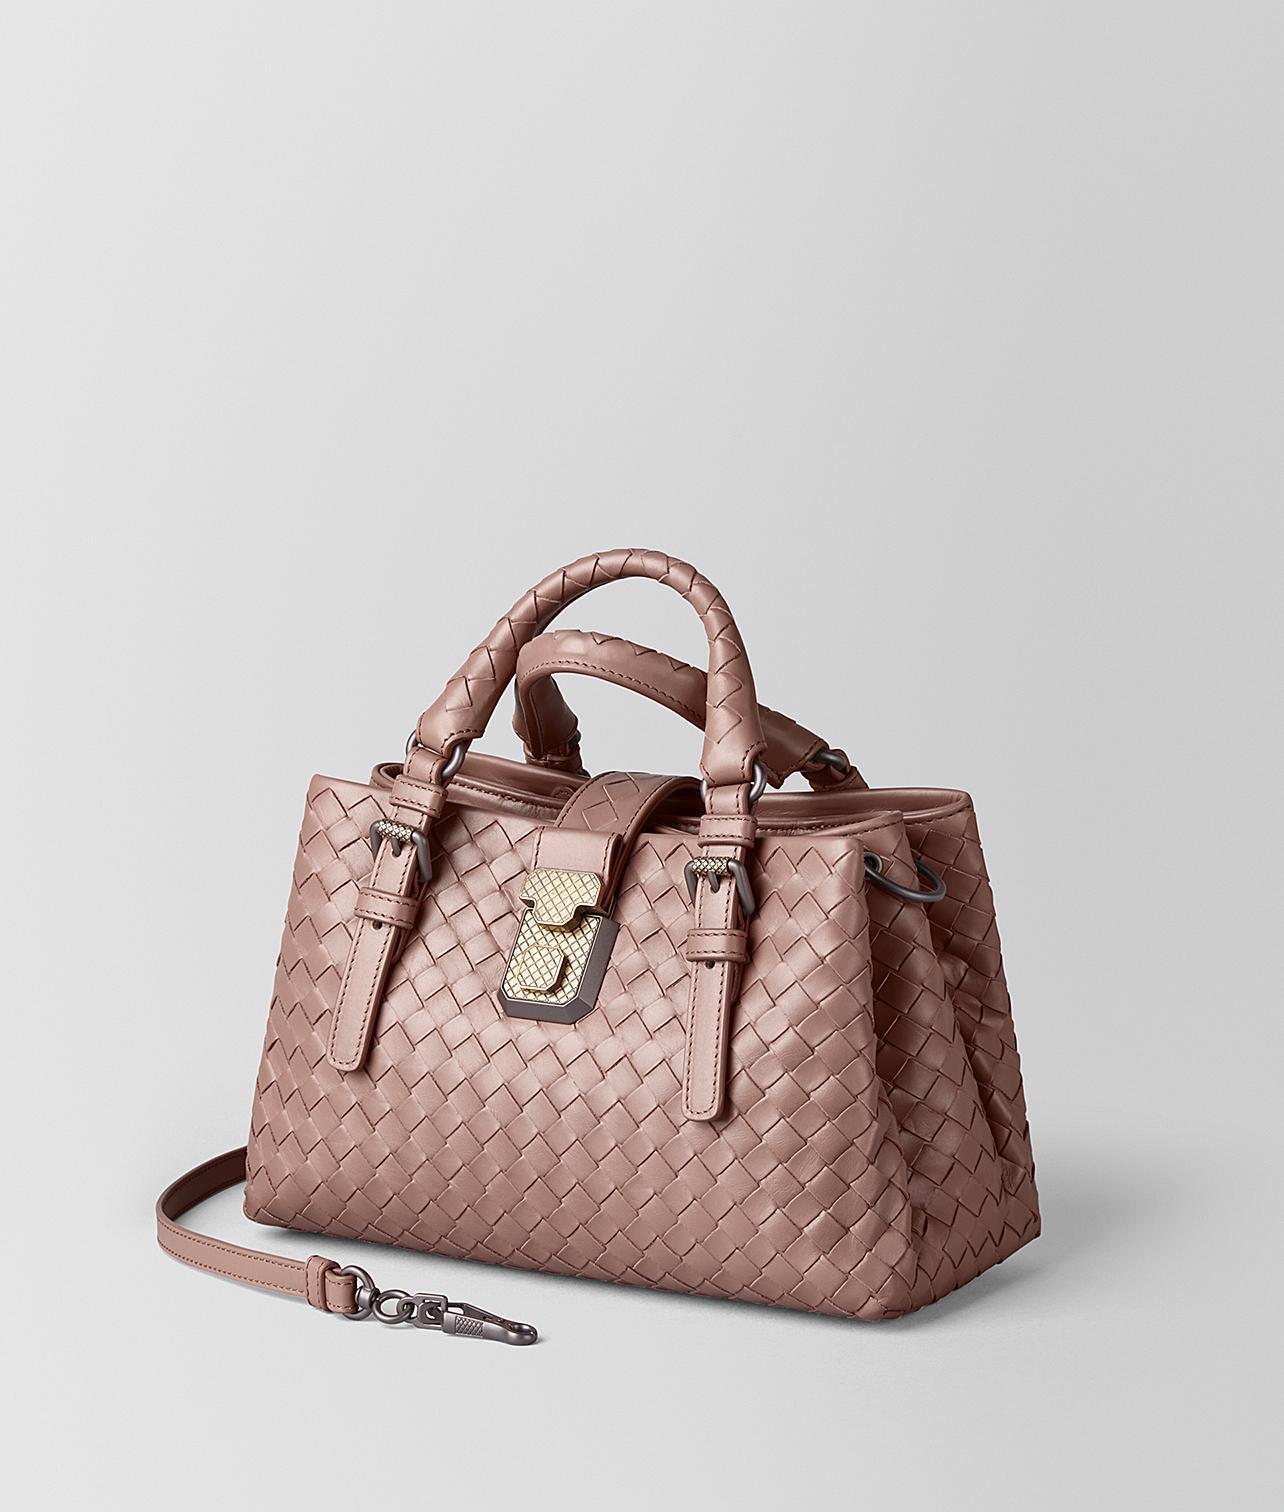 ad743e7fe1 Bottega Veneta Mini Roma Bag In Intrecciato Calf Leather - Lyst